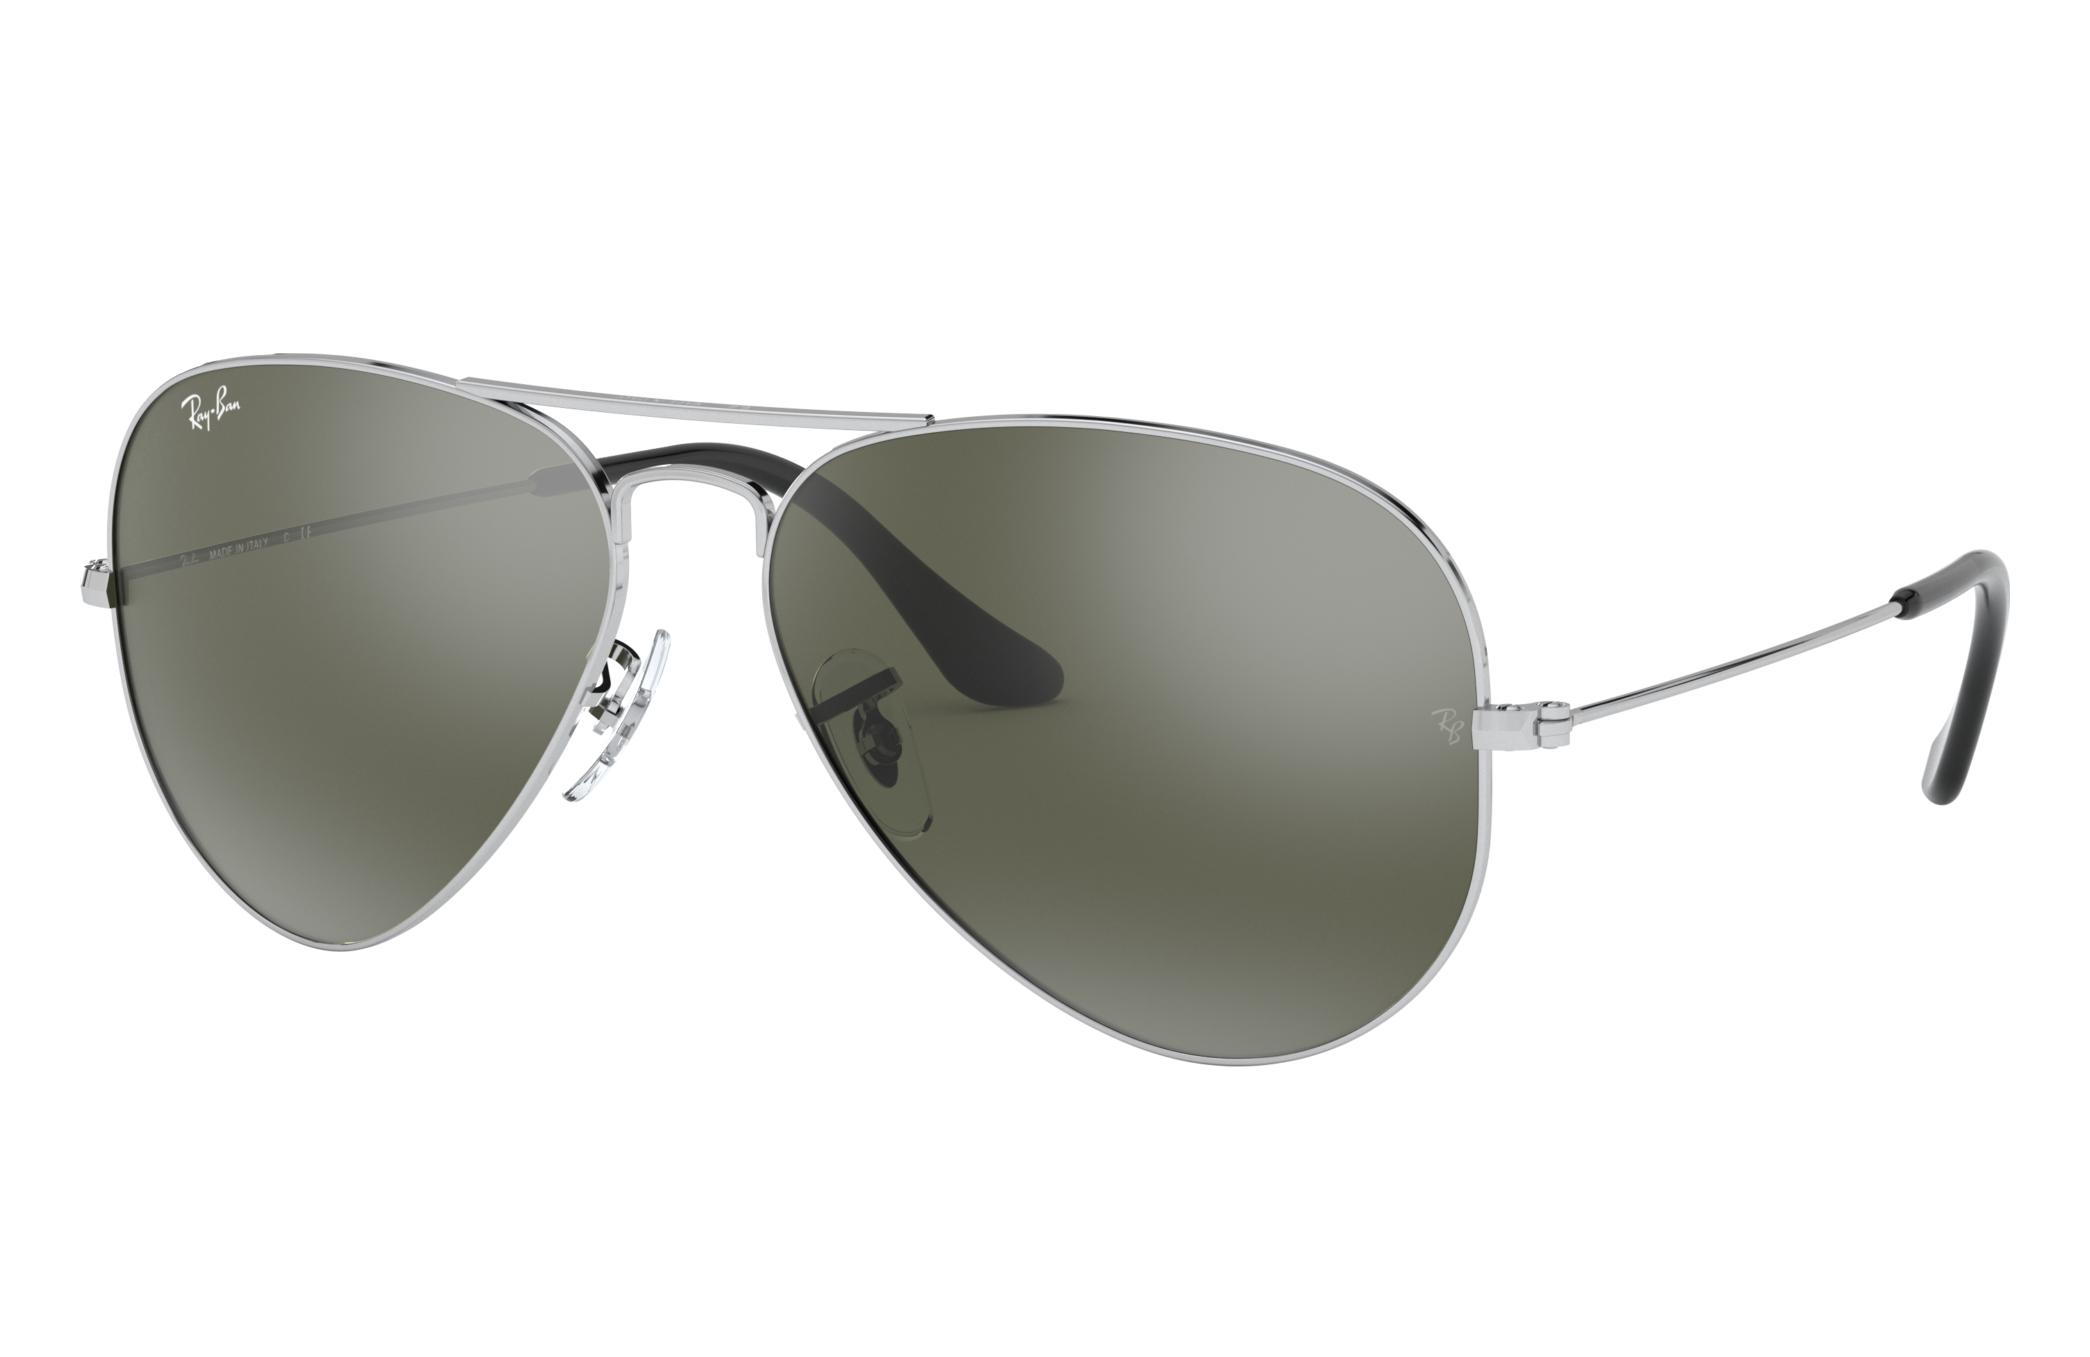 Ray-Ban Aviator Mirror Silver, Gray Lenses - RB3025